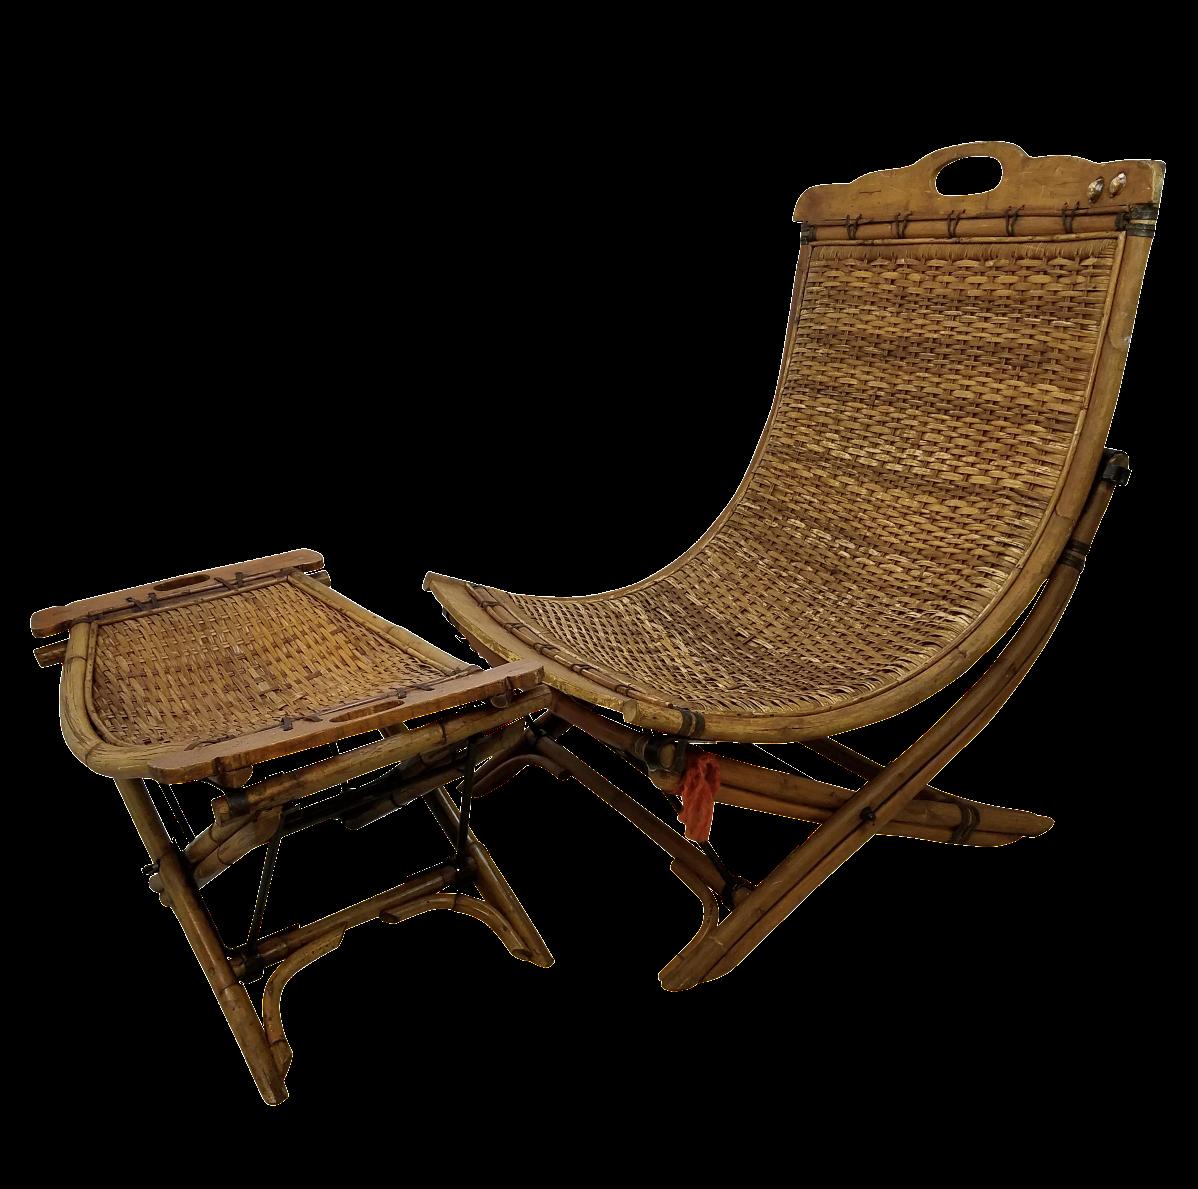 Vintage Rattan Sling Chair With Ottoman Chairish